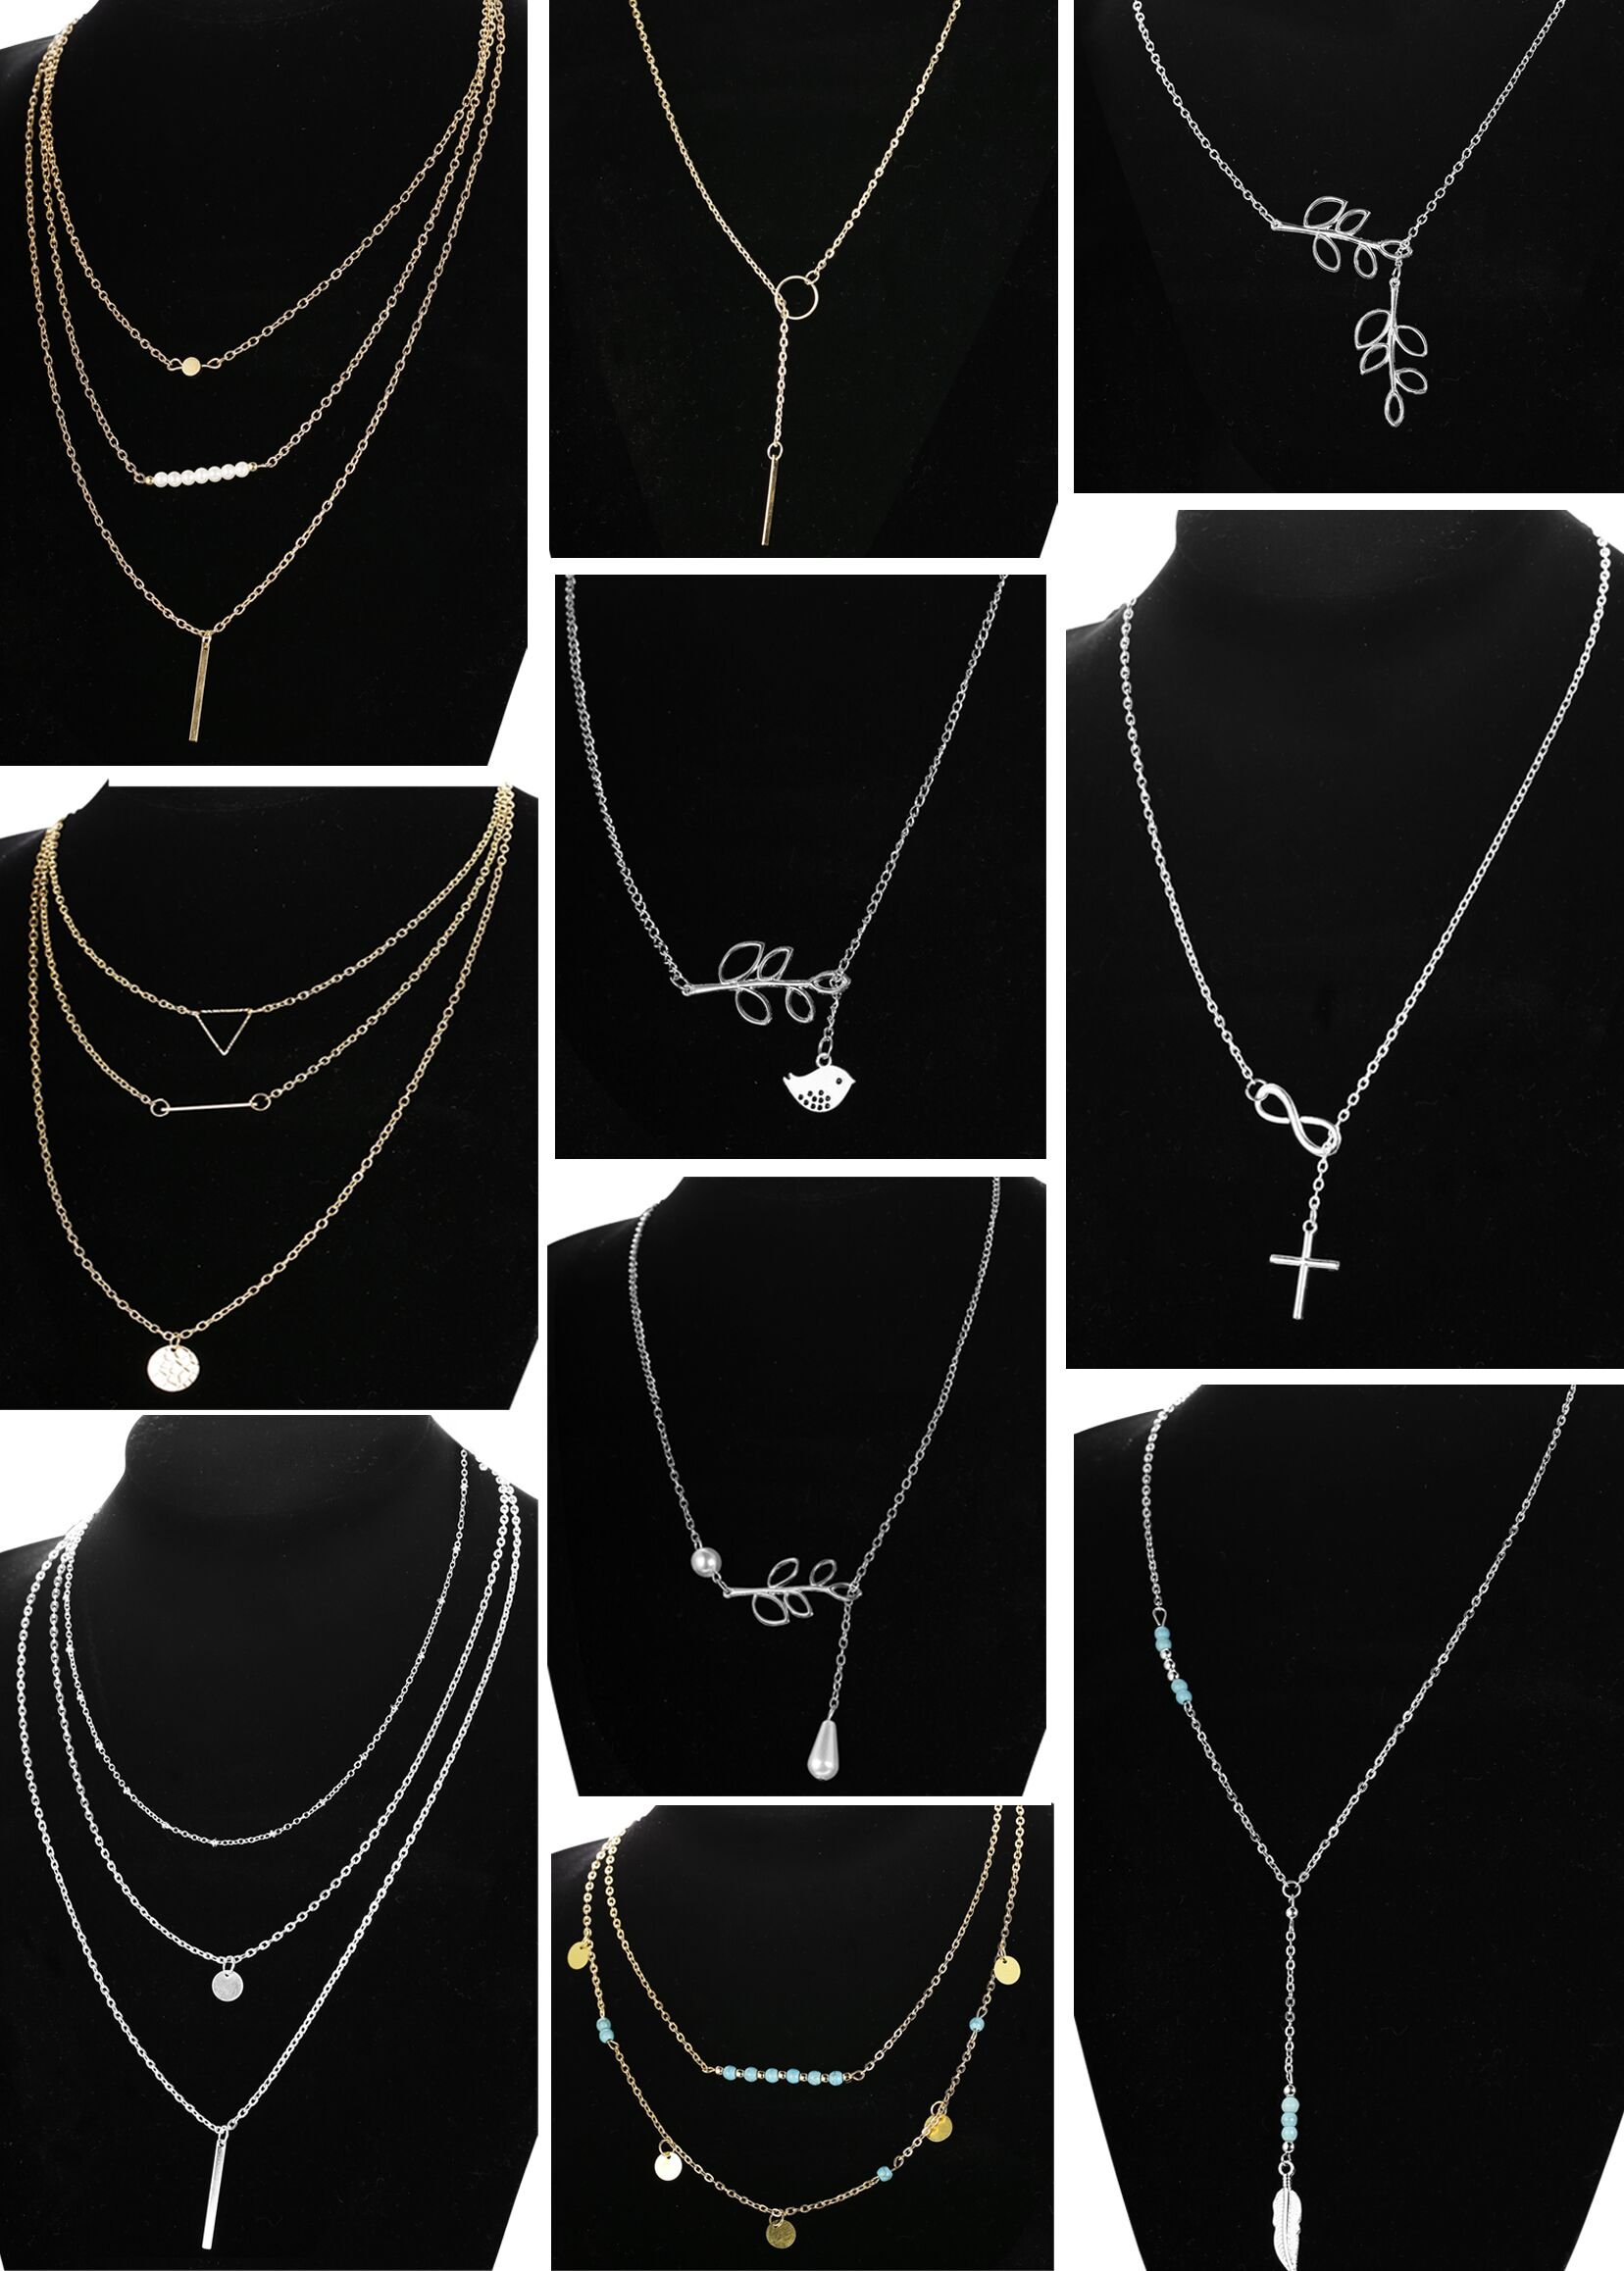 LOLIAS 10 Pcs Layered Pendant Necklace for Women Girls Boho Y Choker Necklace Set